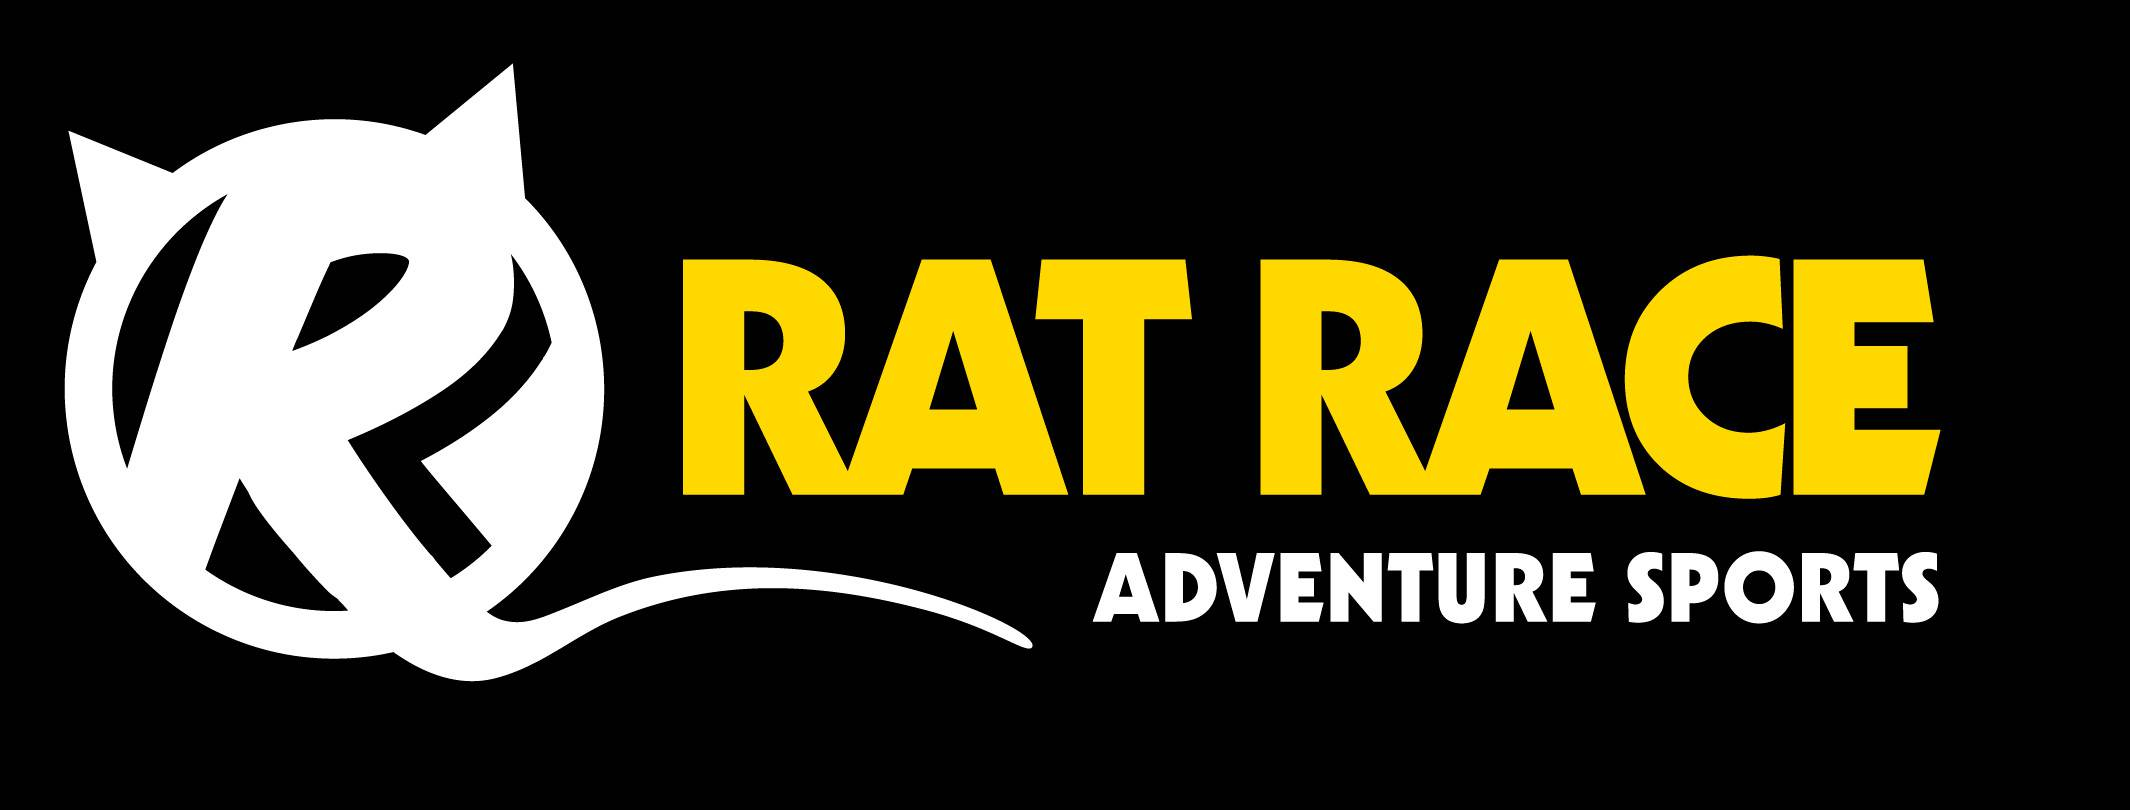 Rat Race coupon codes